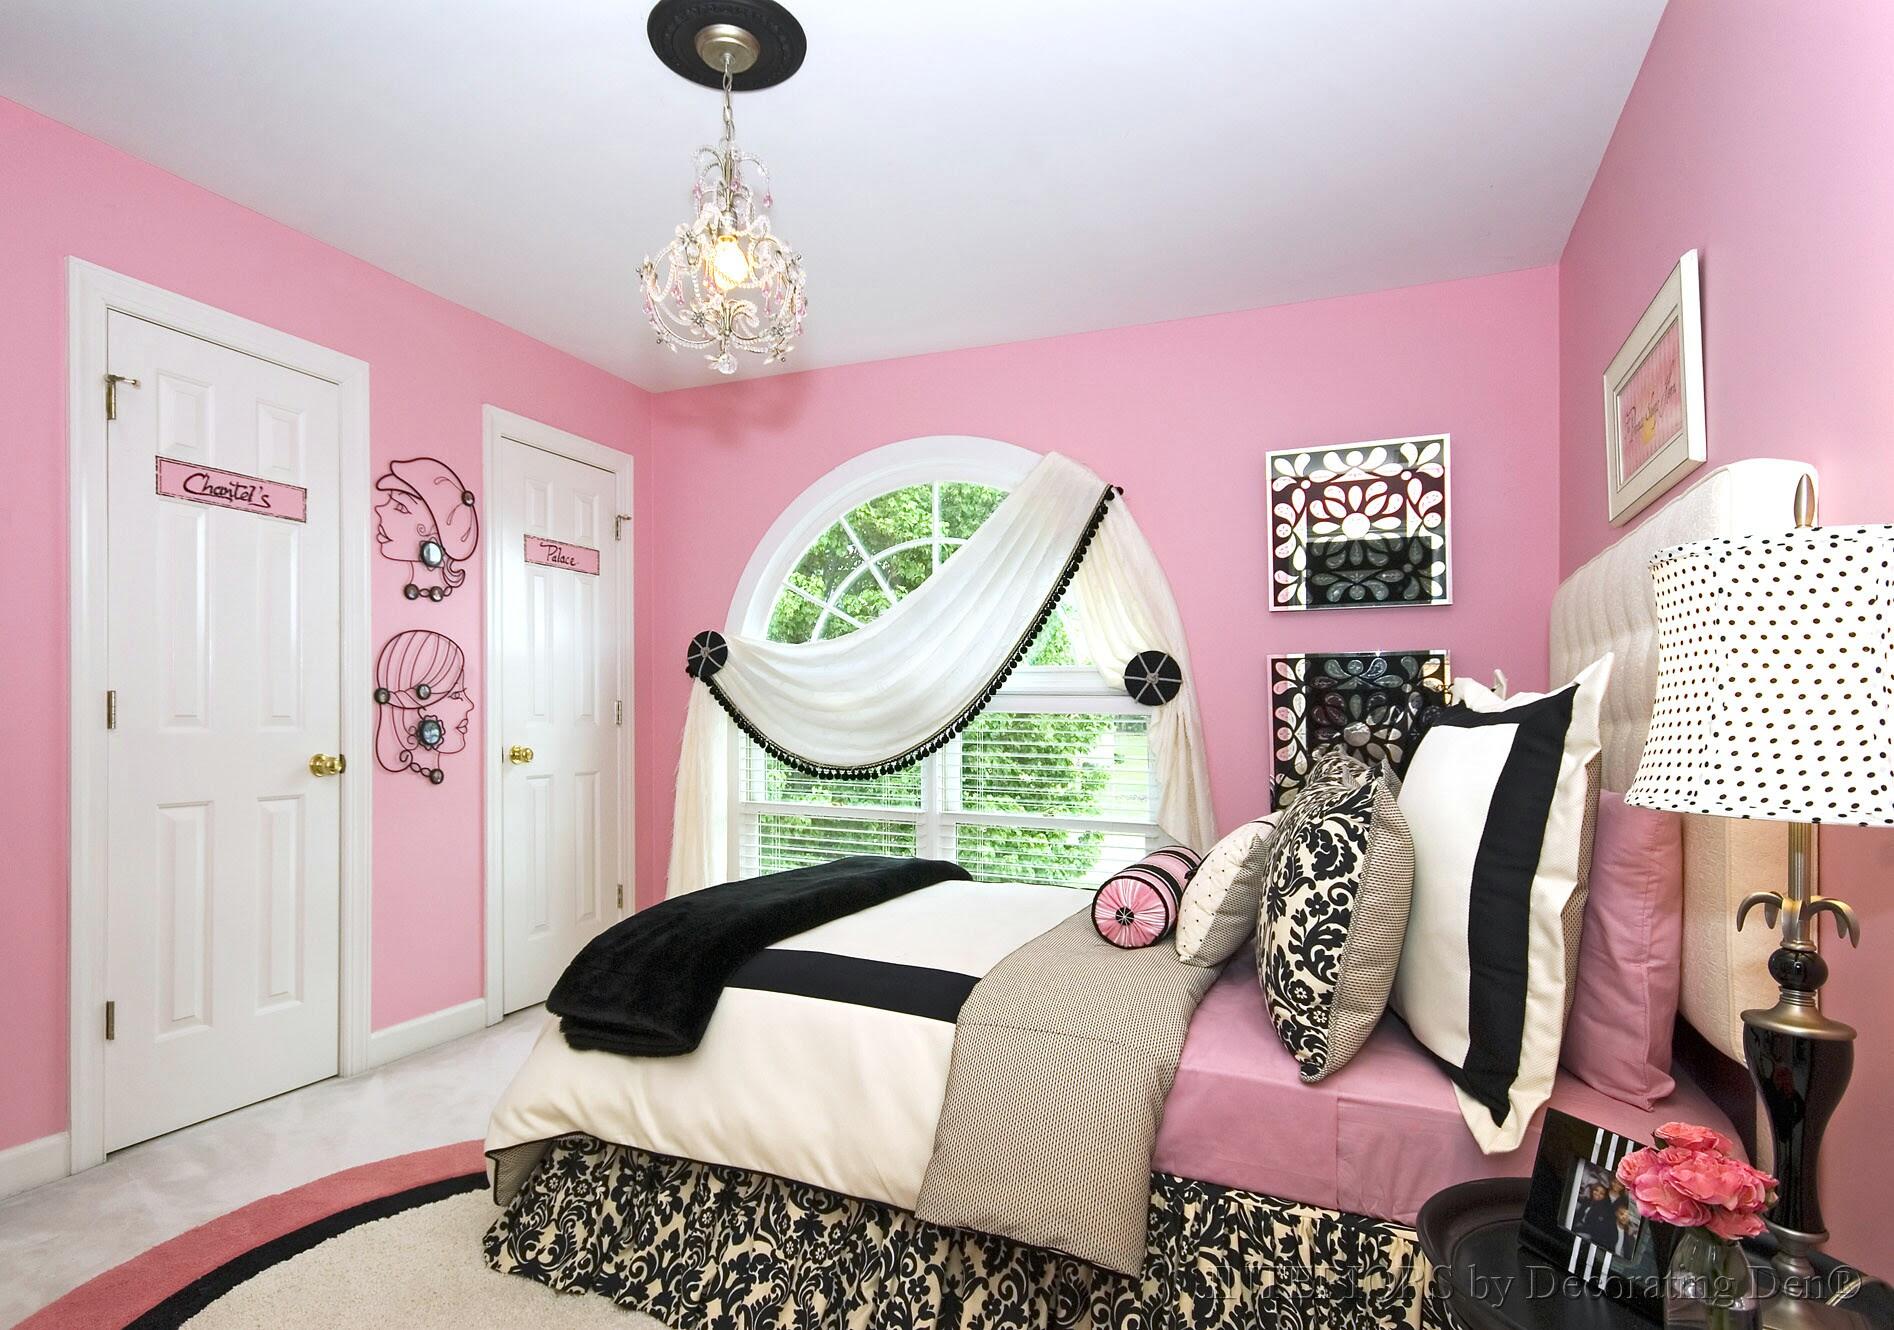 Bedroom Decorating Ideas For Teenage Girl